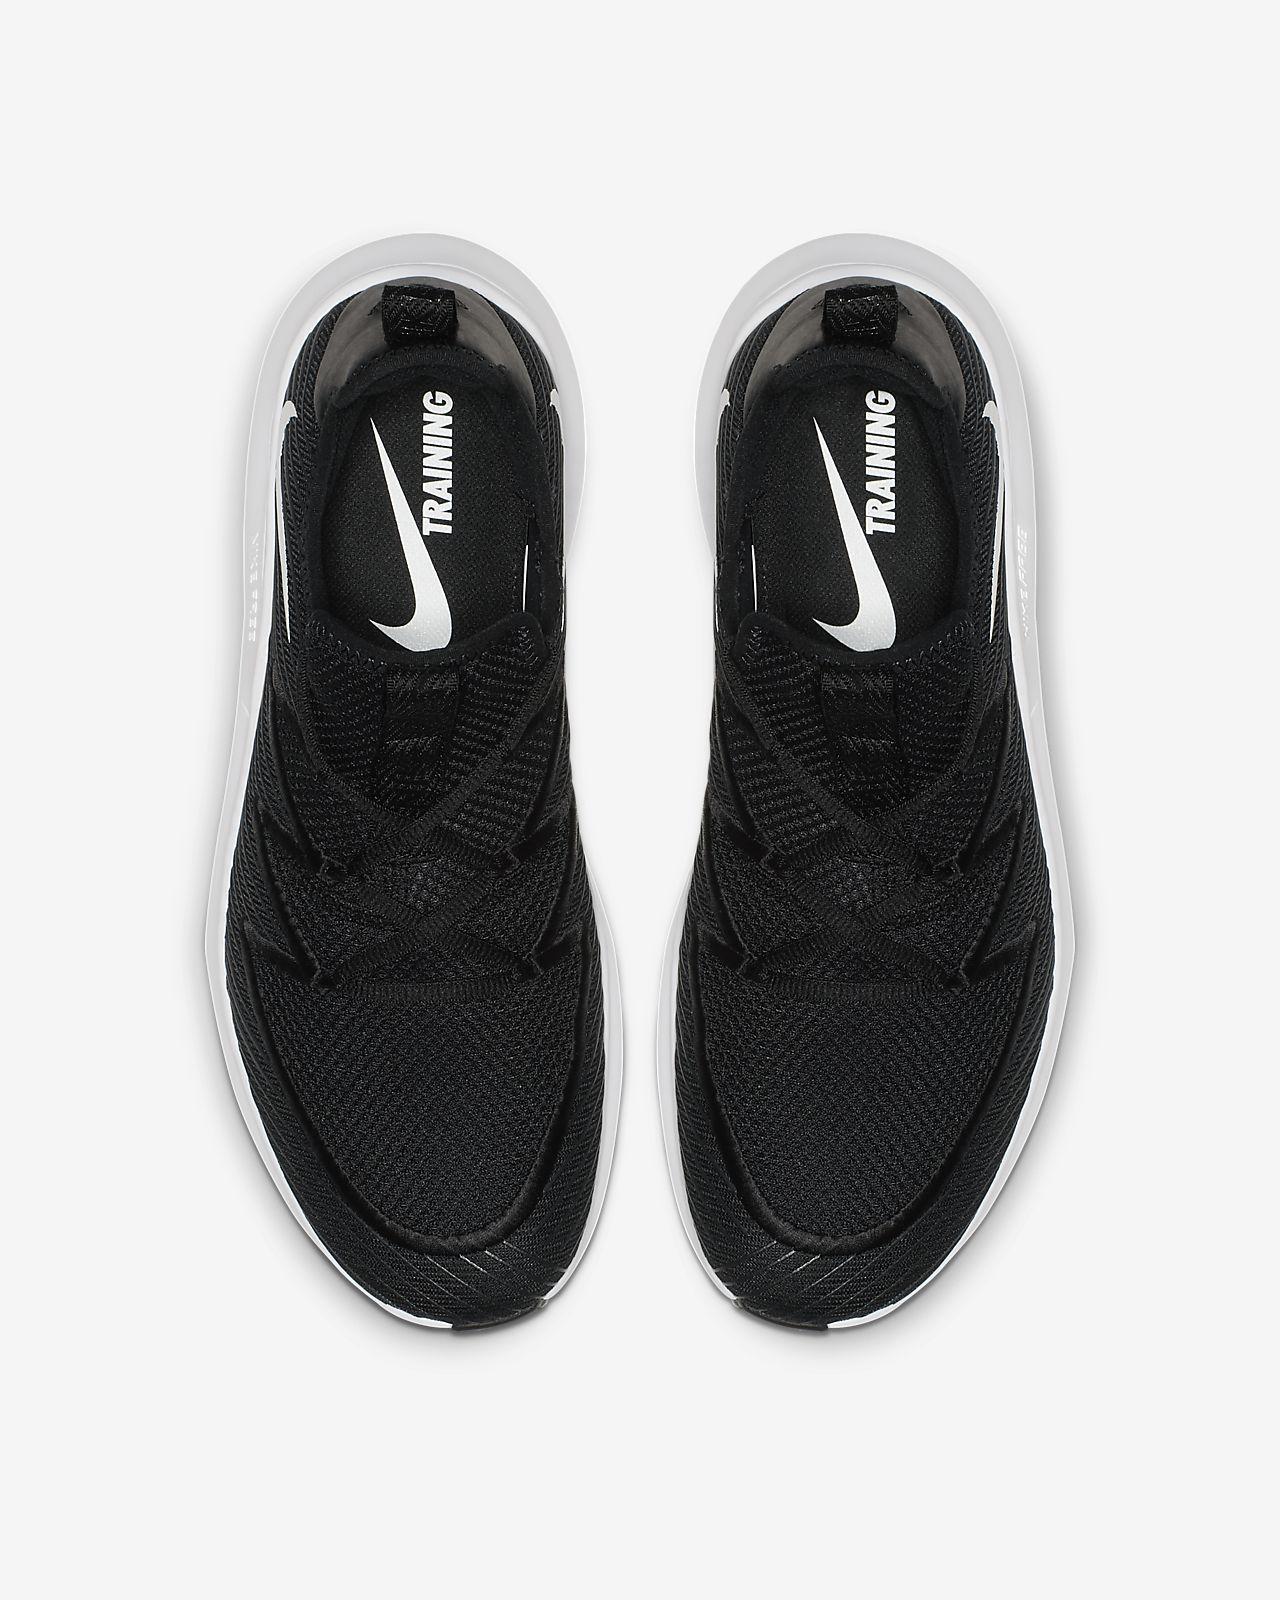 3332c1303a6e4 Nike Free TR 9 Ultra Men s Training Shoe. Nike.com GB